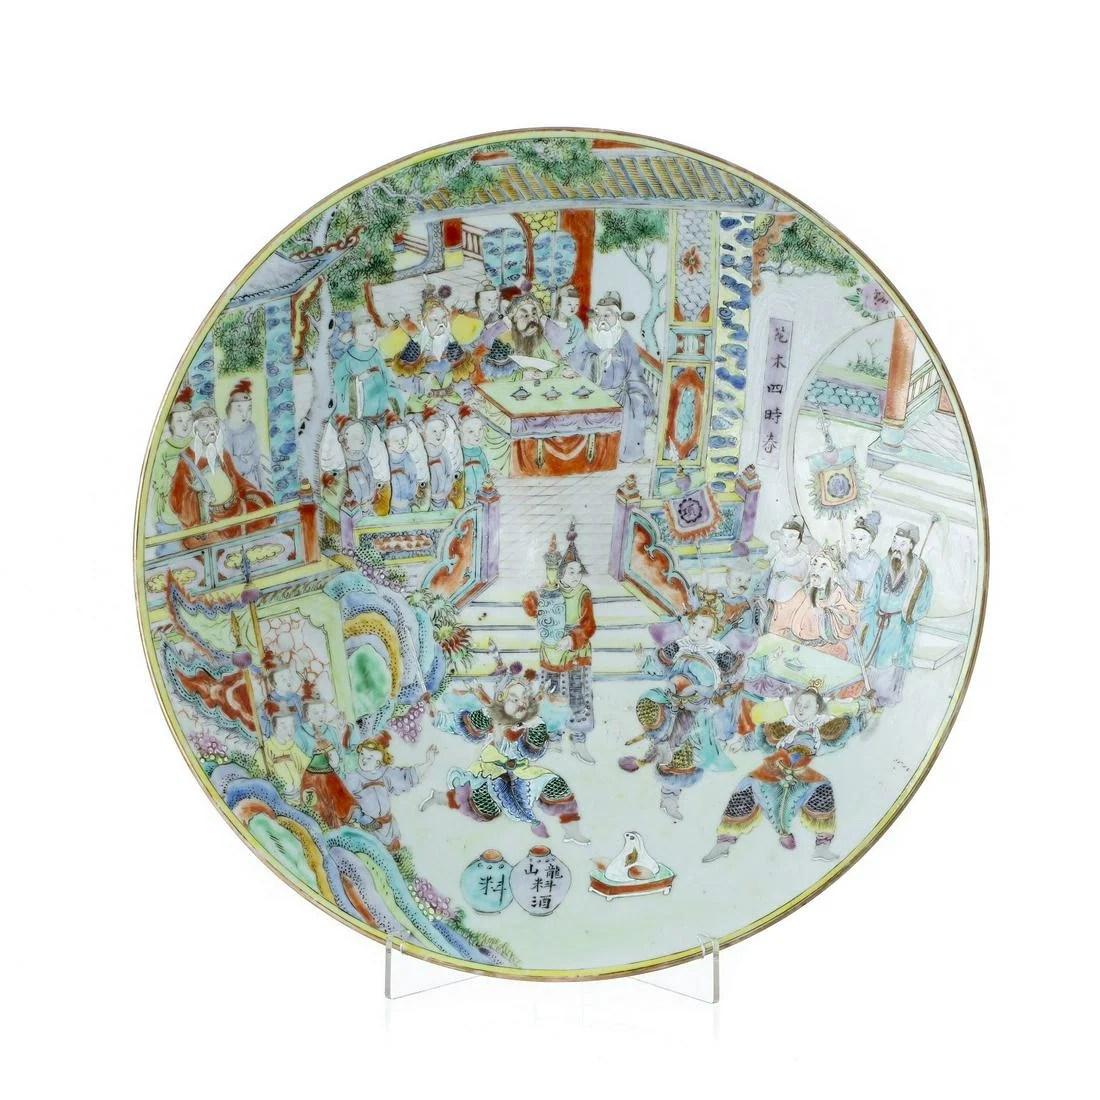 Large Mandarin Plate in Chinese Porcelain, Guangxu